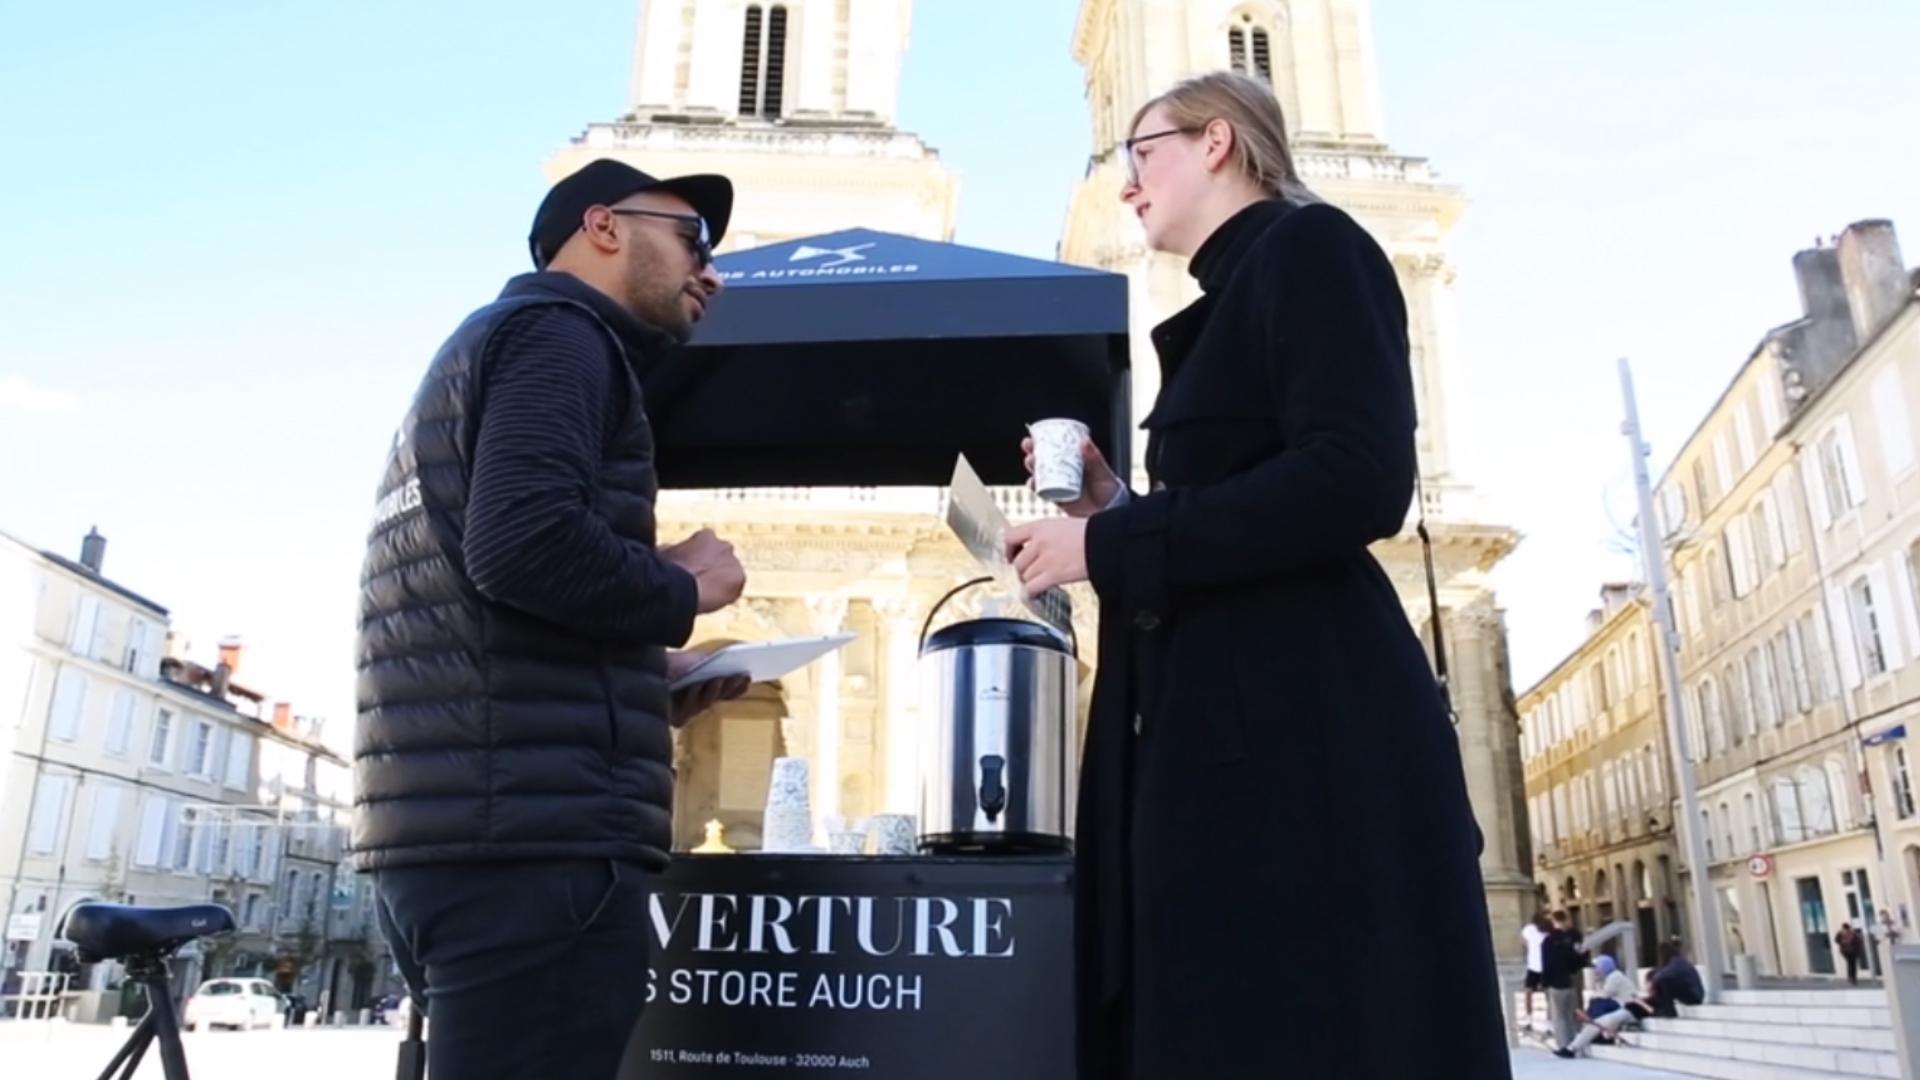 Création de Trafic - Keemia Nantes - Agence de Marketing Locale en région Atlantique